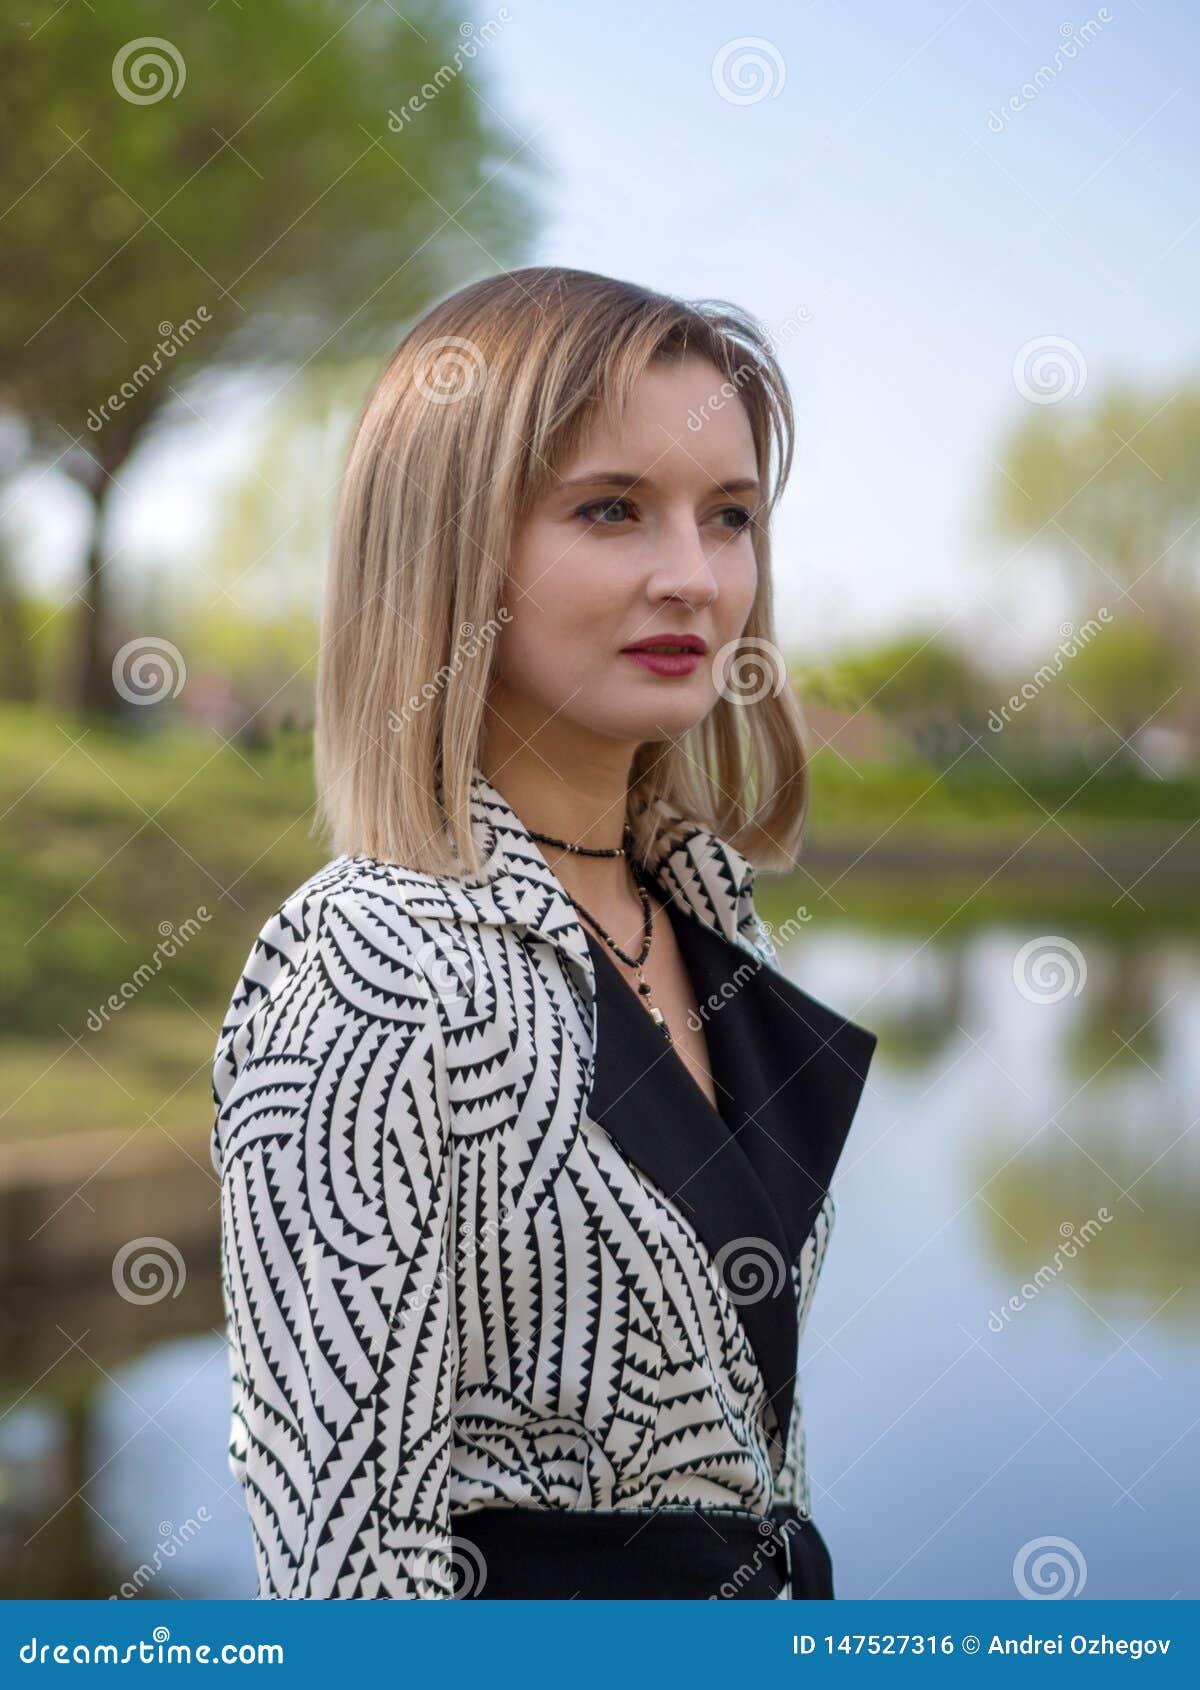 Mujer rubia con estilo